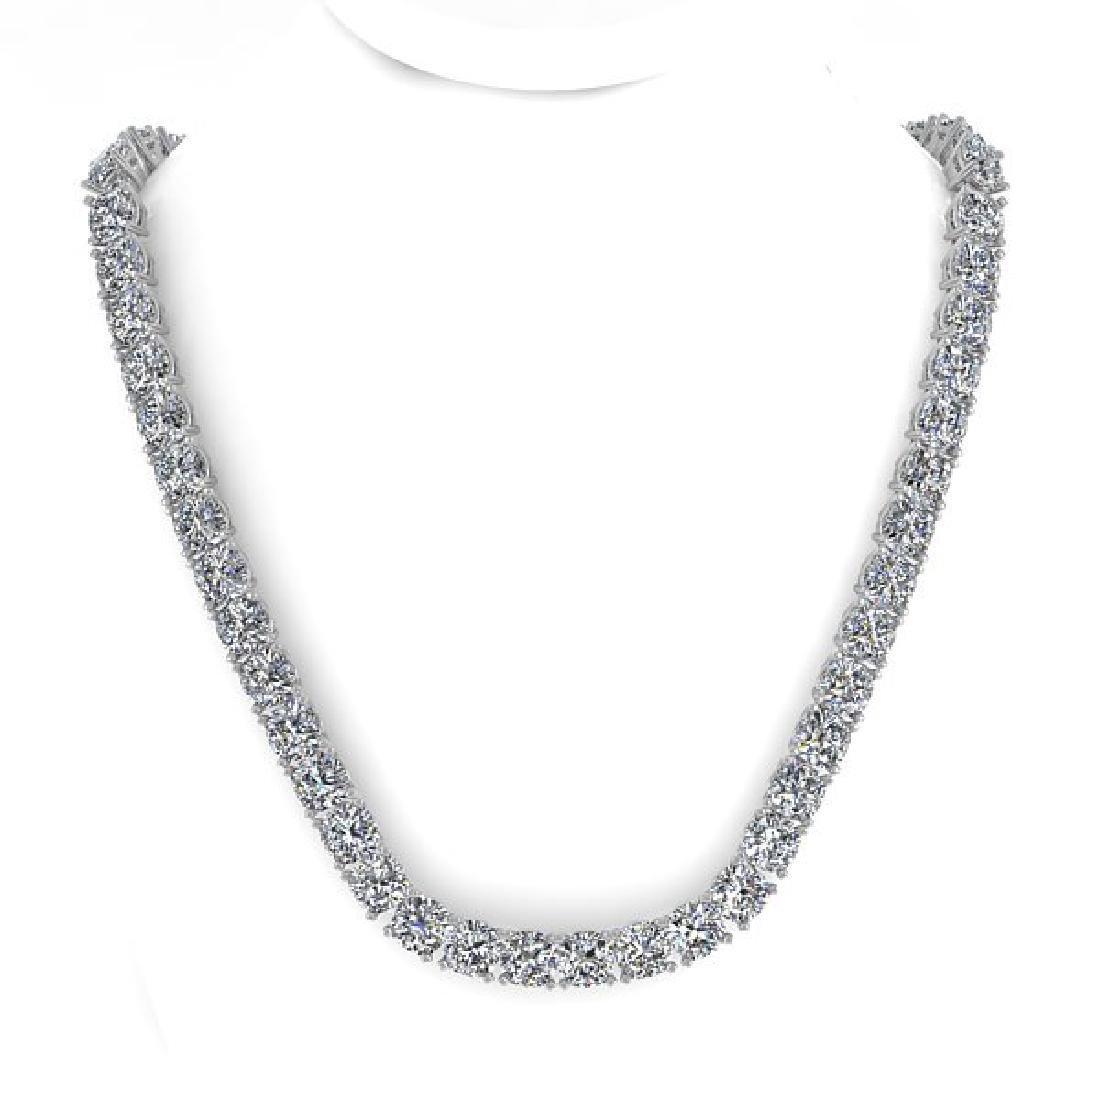 35 CTW Cushion Cut Certified SI Diamond Necklace 14K - 3